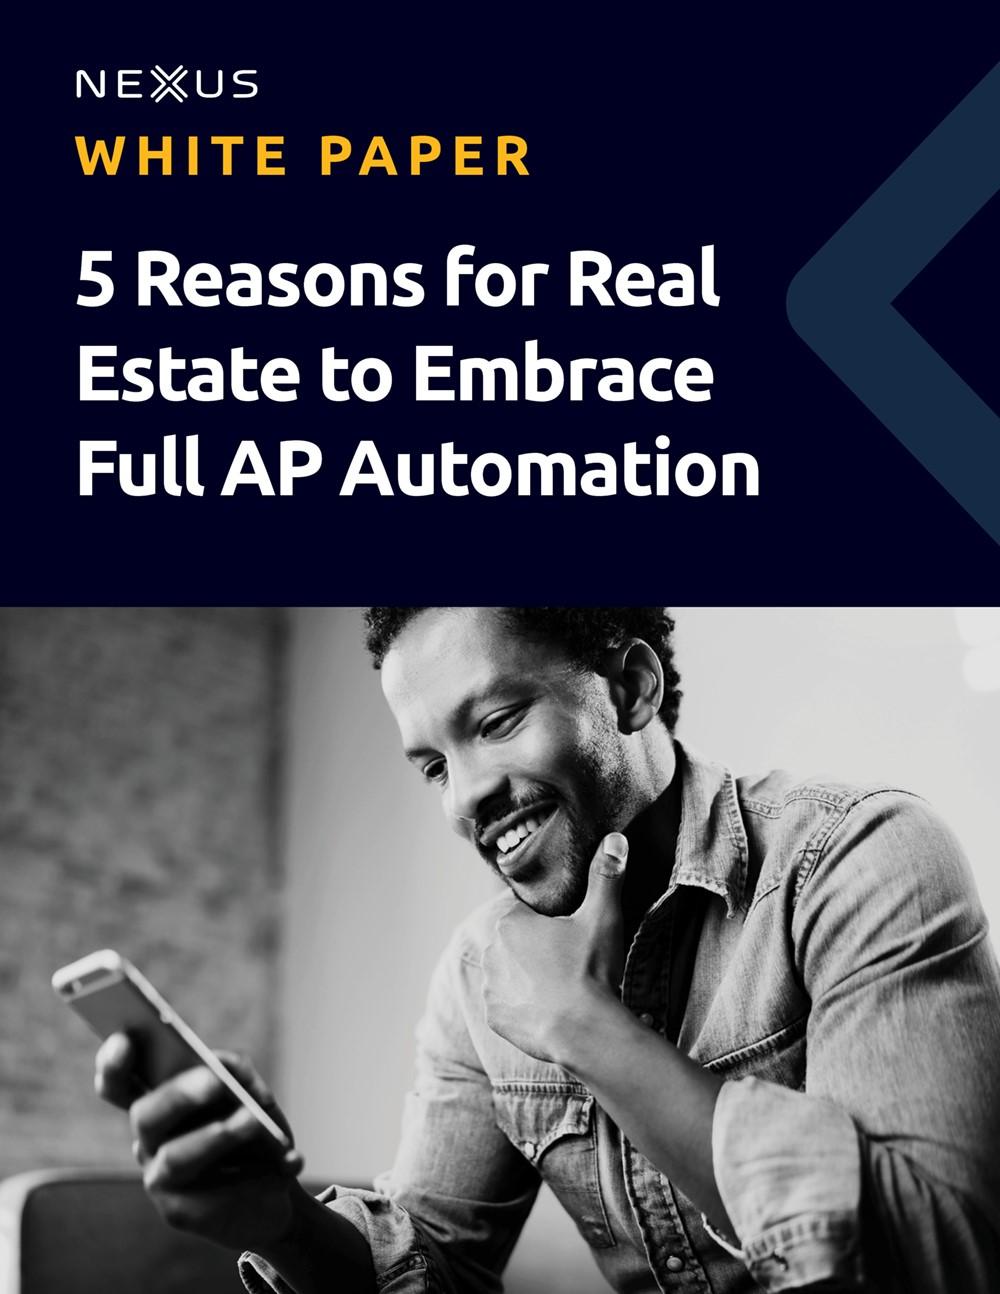 Full AP Automation Thumbnail 2.jpg